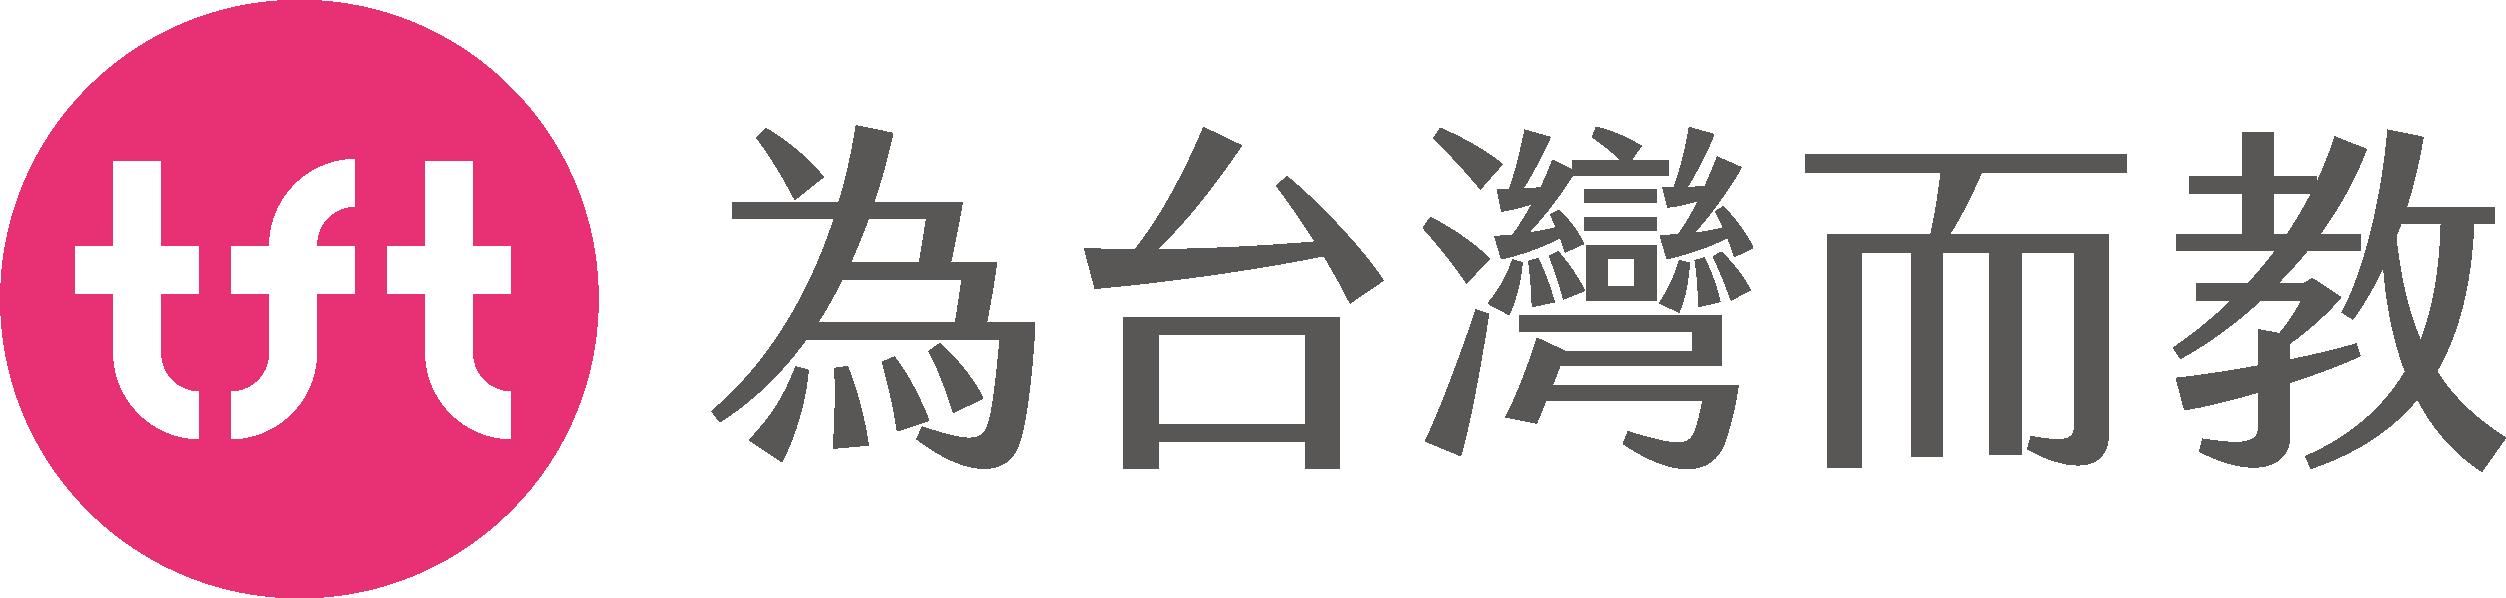 logo-2019